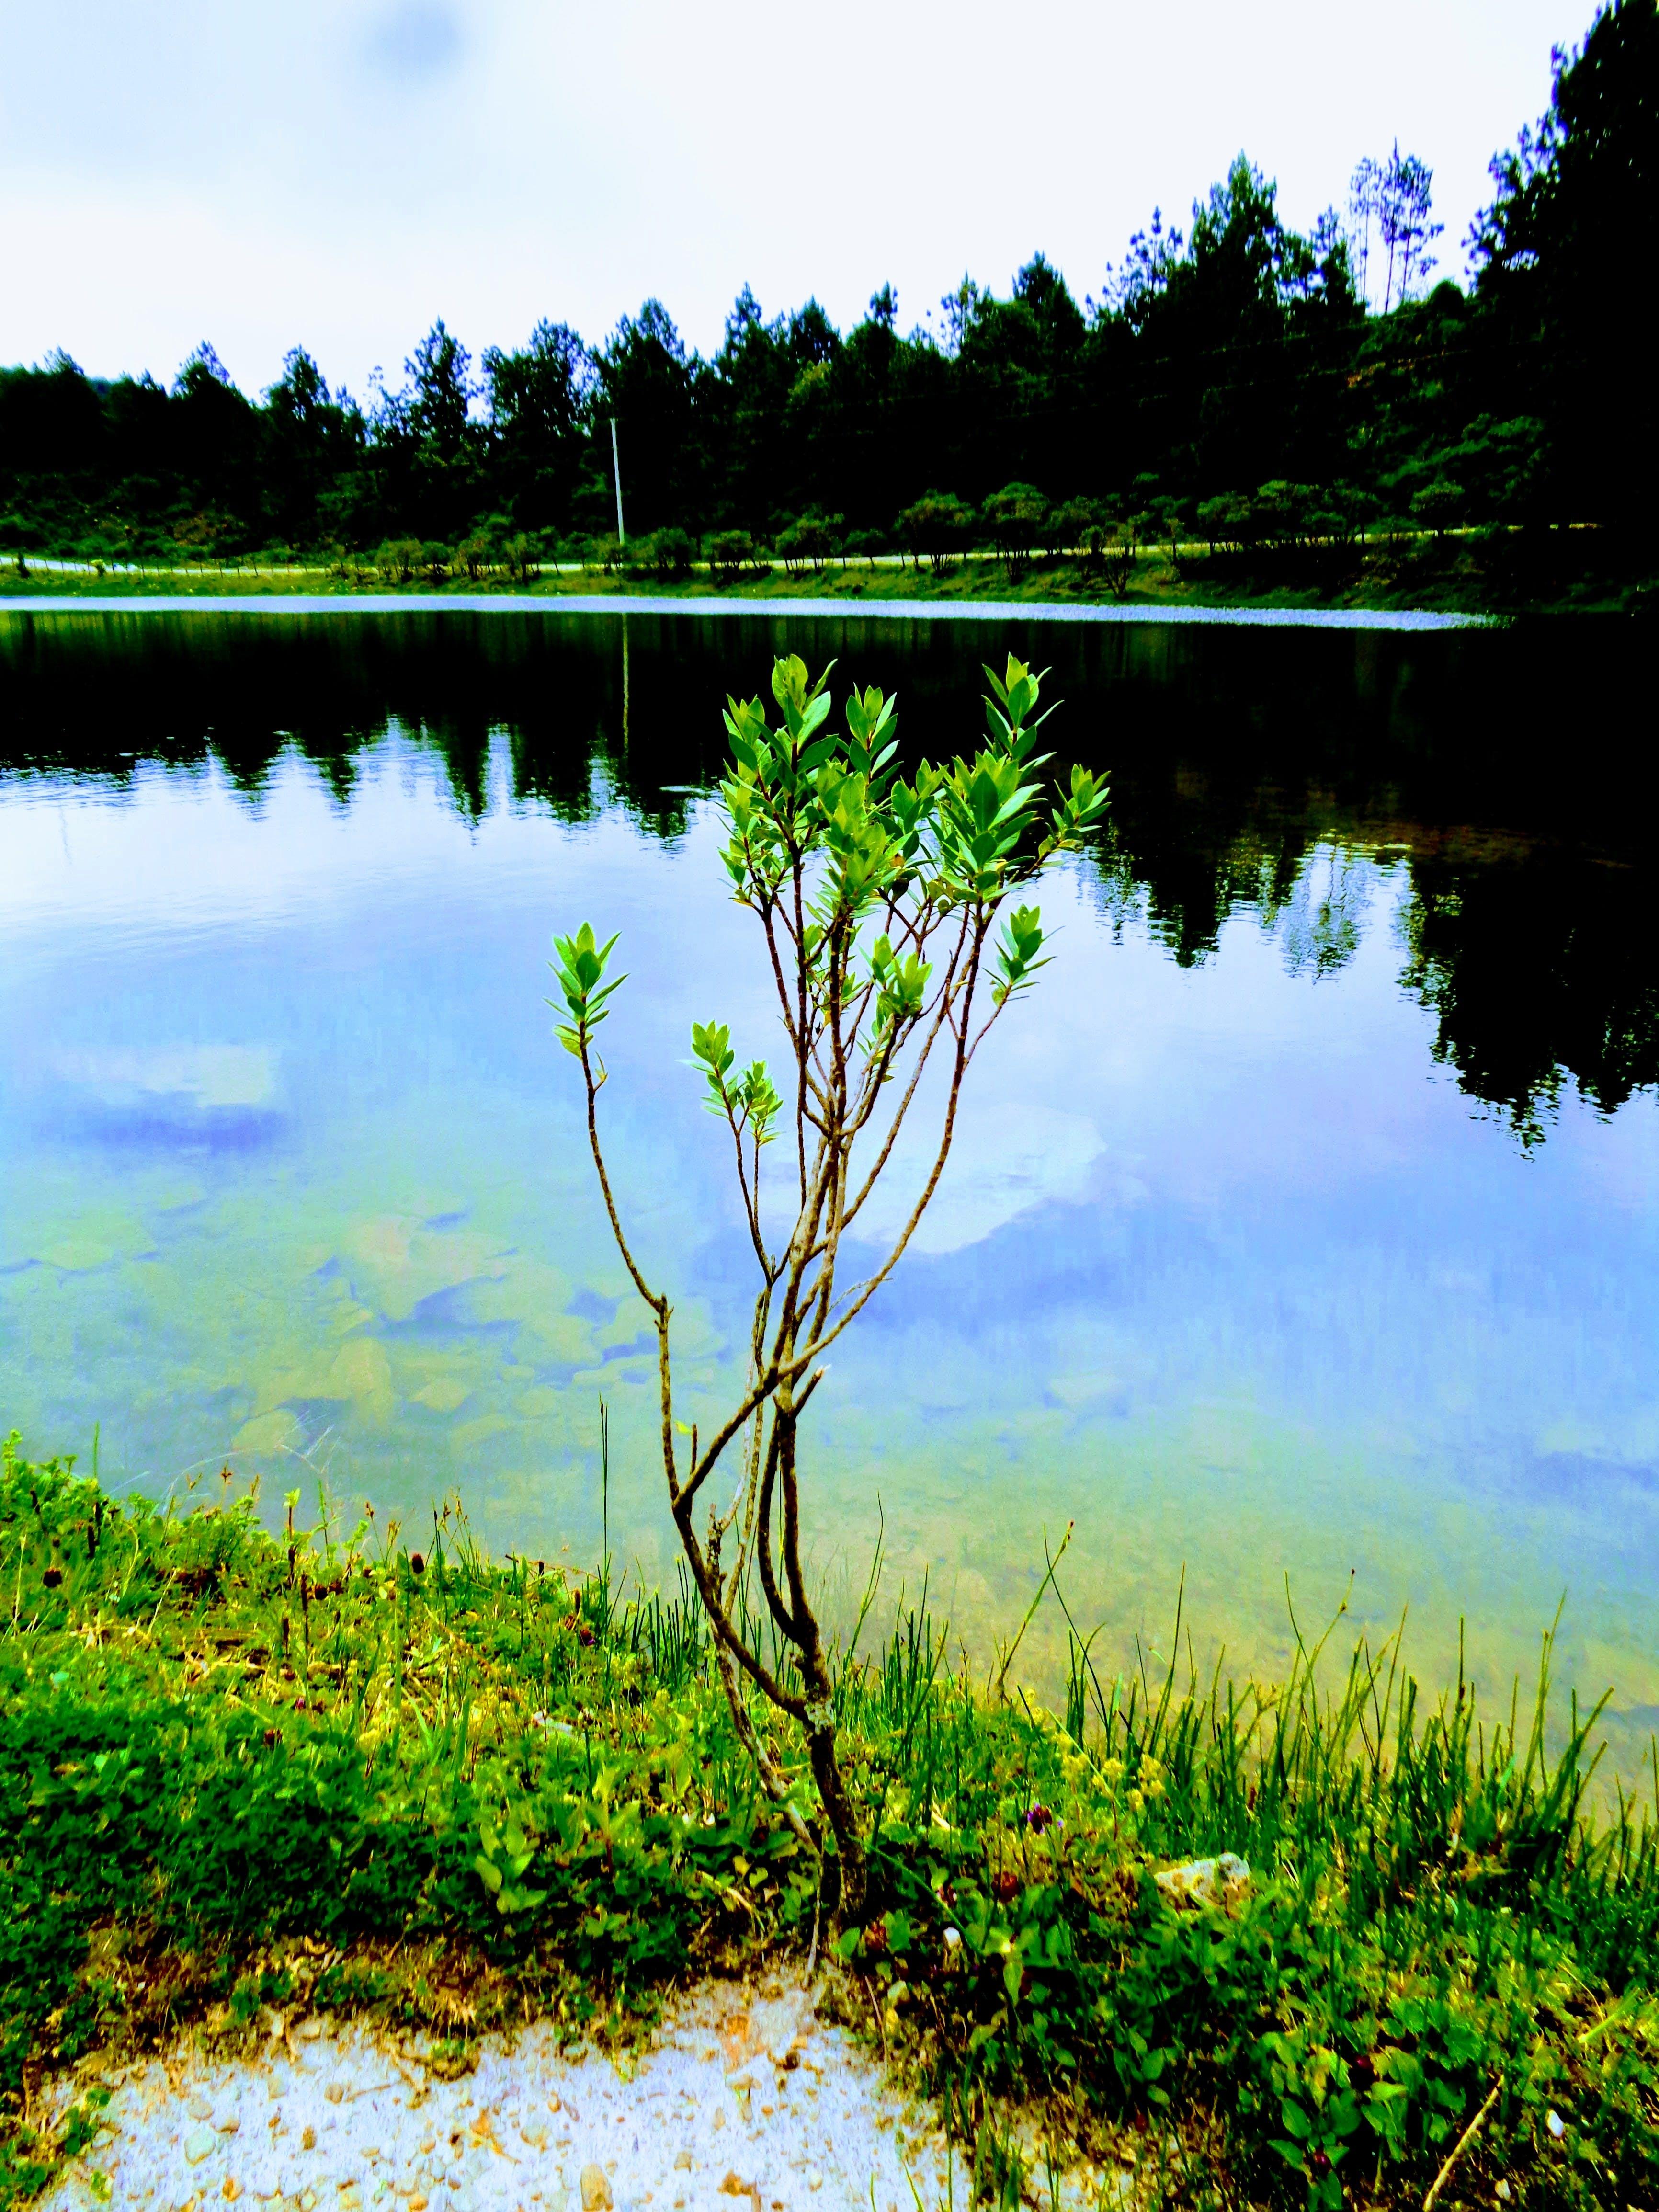 Green Leaf Plant Near Body of Water